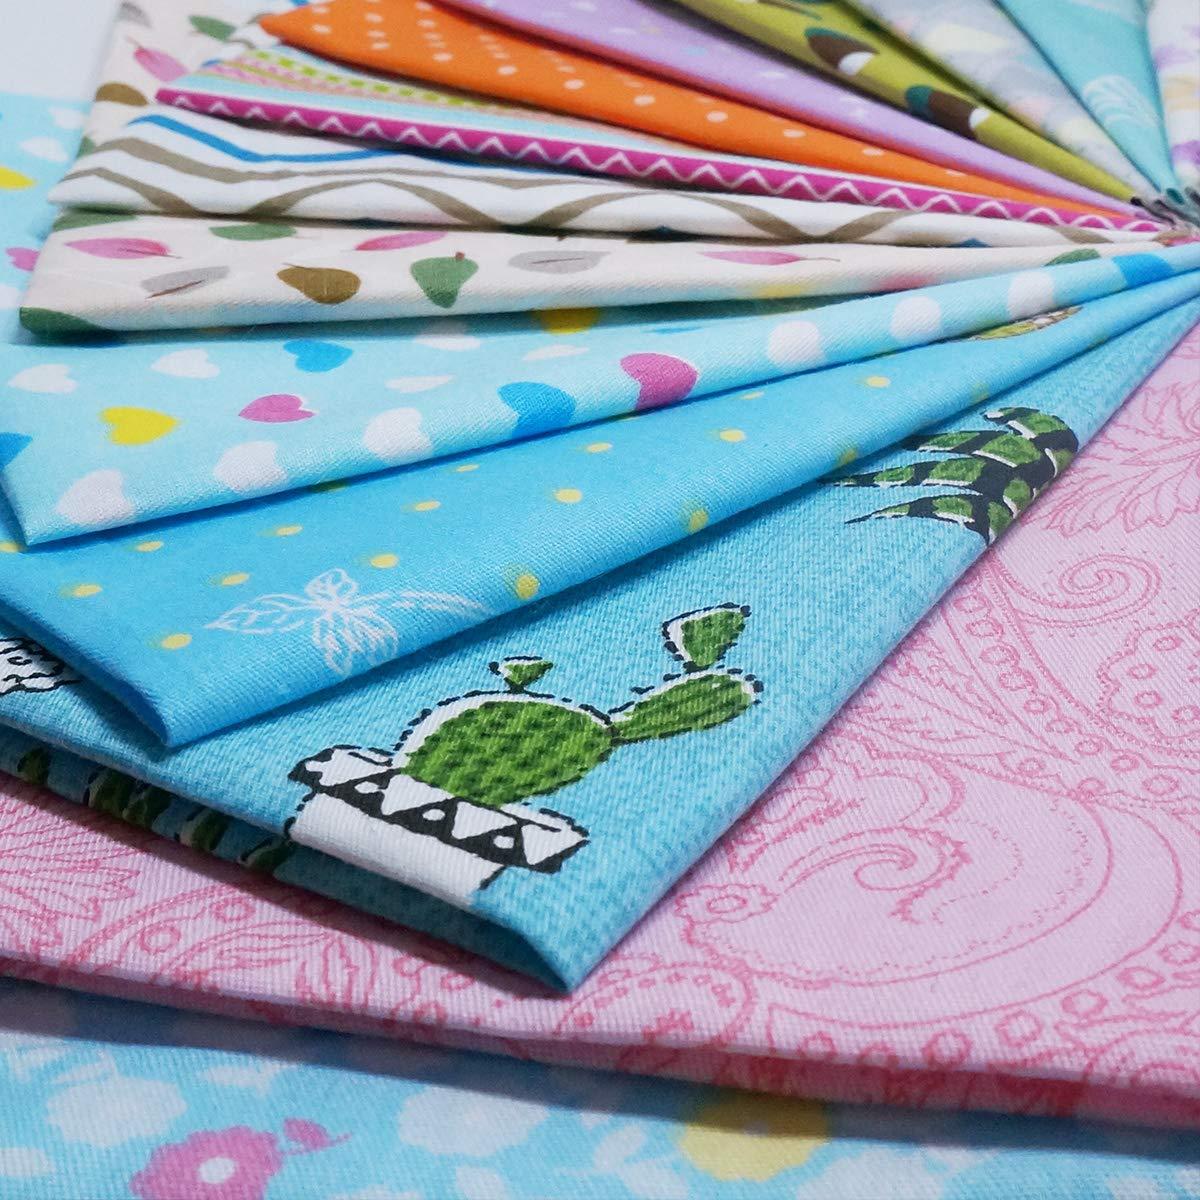 30cm x 30cm Cotton Craft Fabric Bundle Squares Patchwork Pre-Cut Quilt Squares for DIY Sewing Scrapbooking Quilting Dot Pattern Quilting Fabric Misscrafts 25pcs 12 x 12